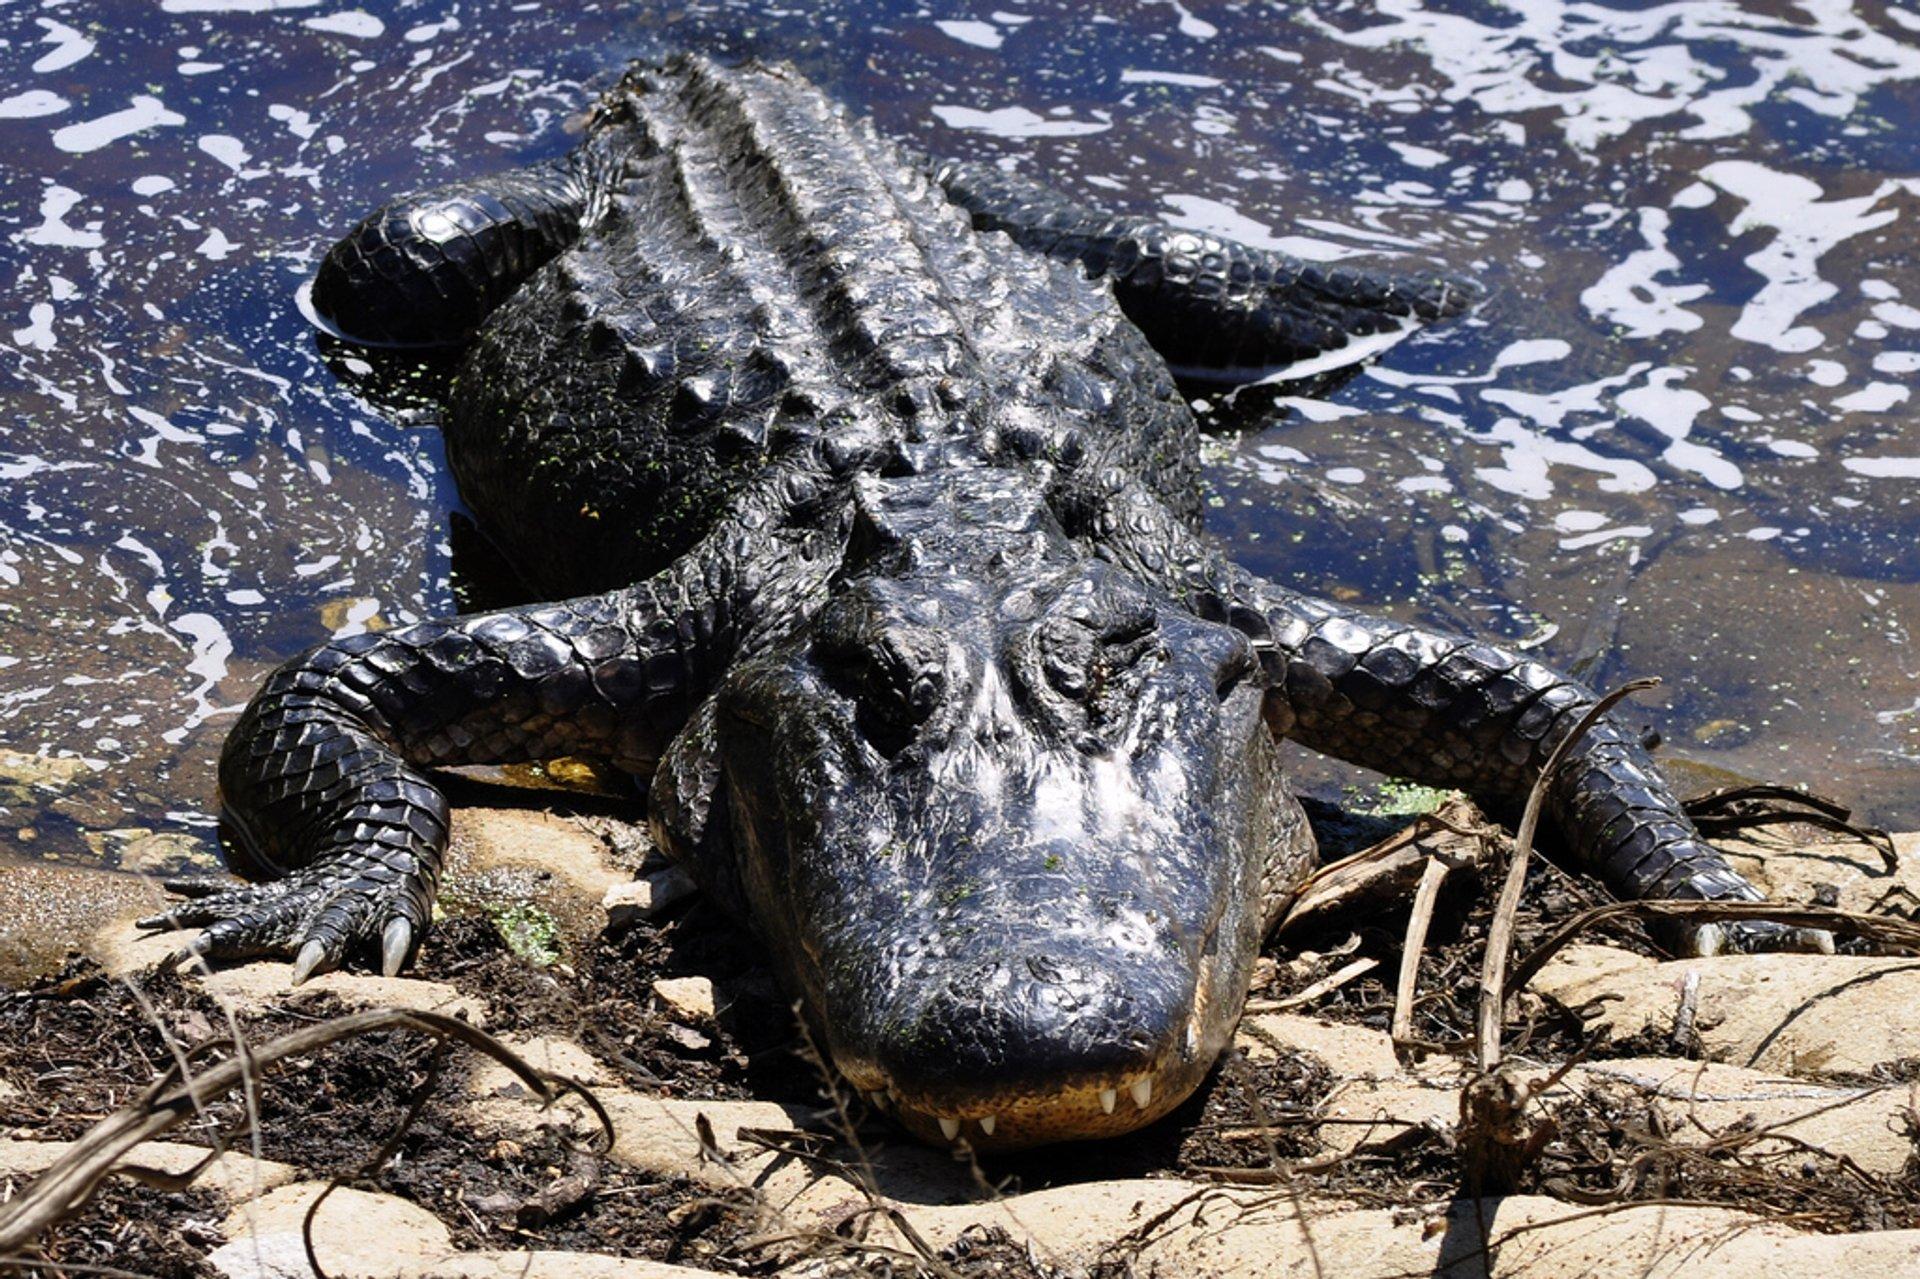 Alligator at Brazos Bend State Park 2019